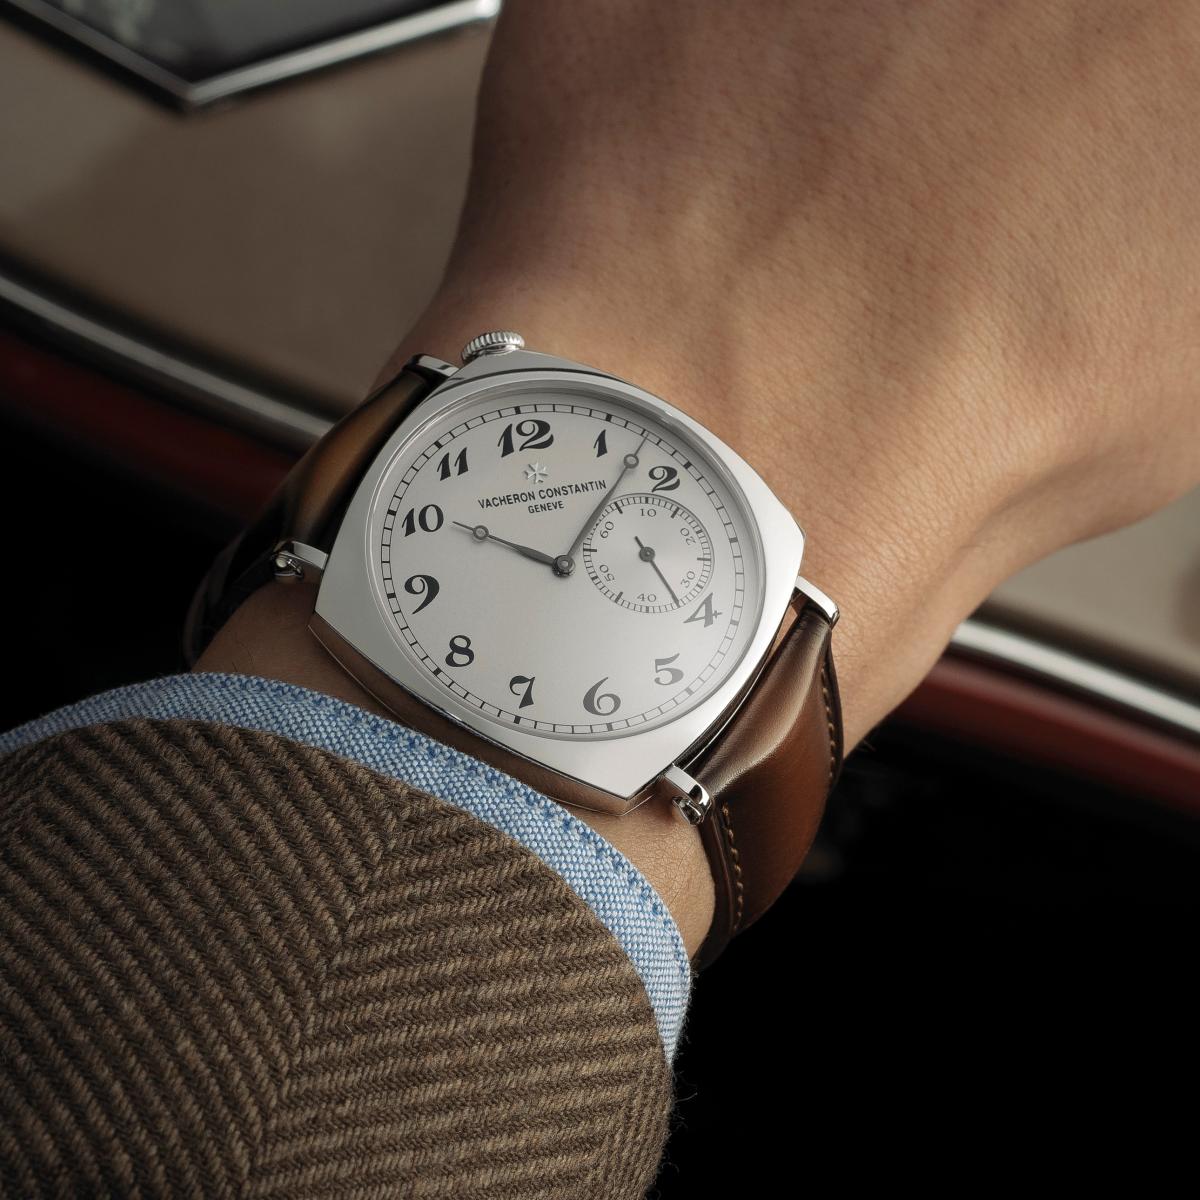 đồng hồ vacheron constantin historiques american 1921 vàng trắng